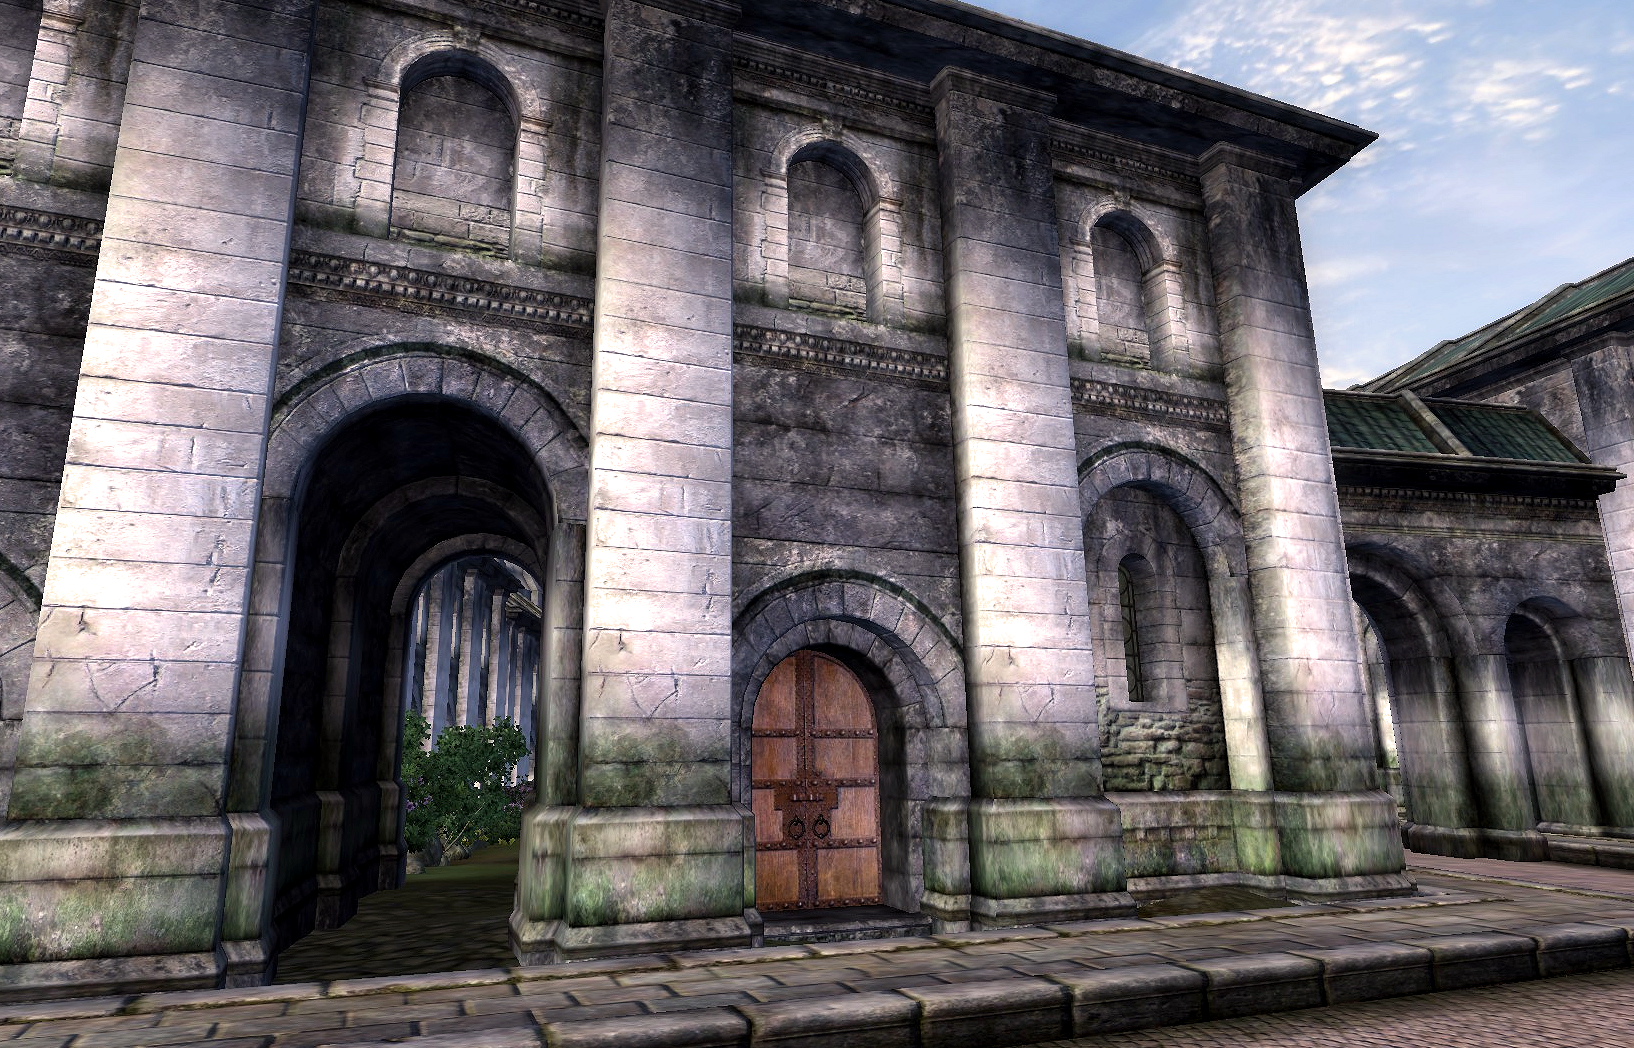 Dul gro-Shug's House